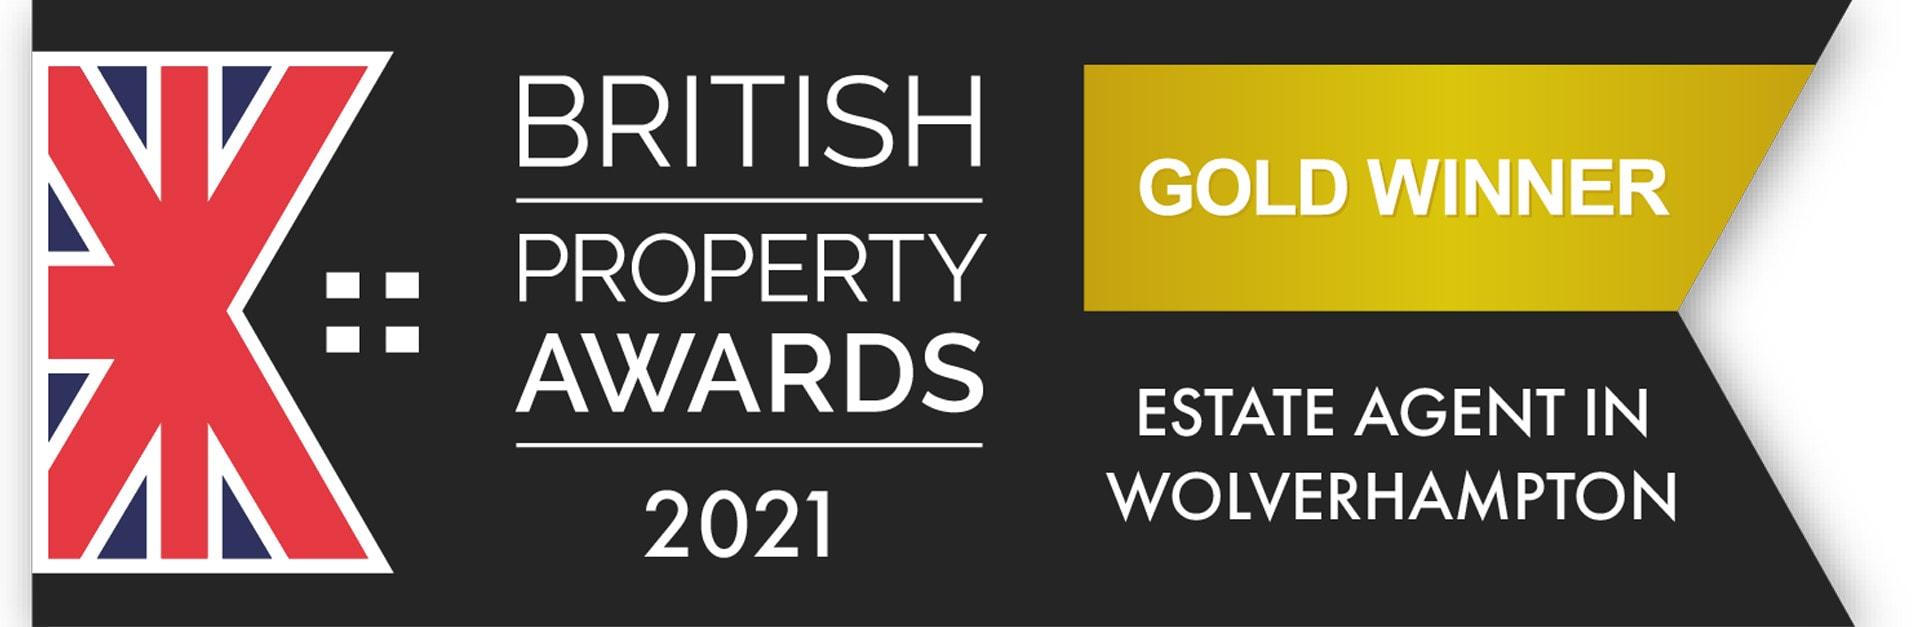 Property in Wolverhampton, Bridgnorth, Wombourne, Worcestershire